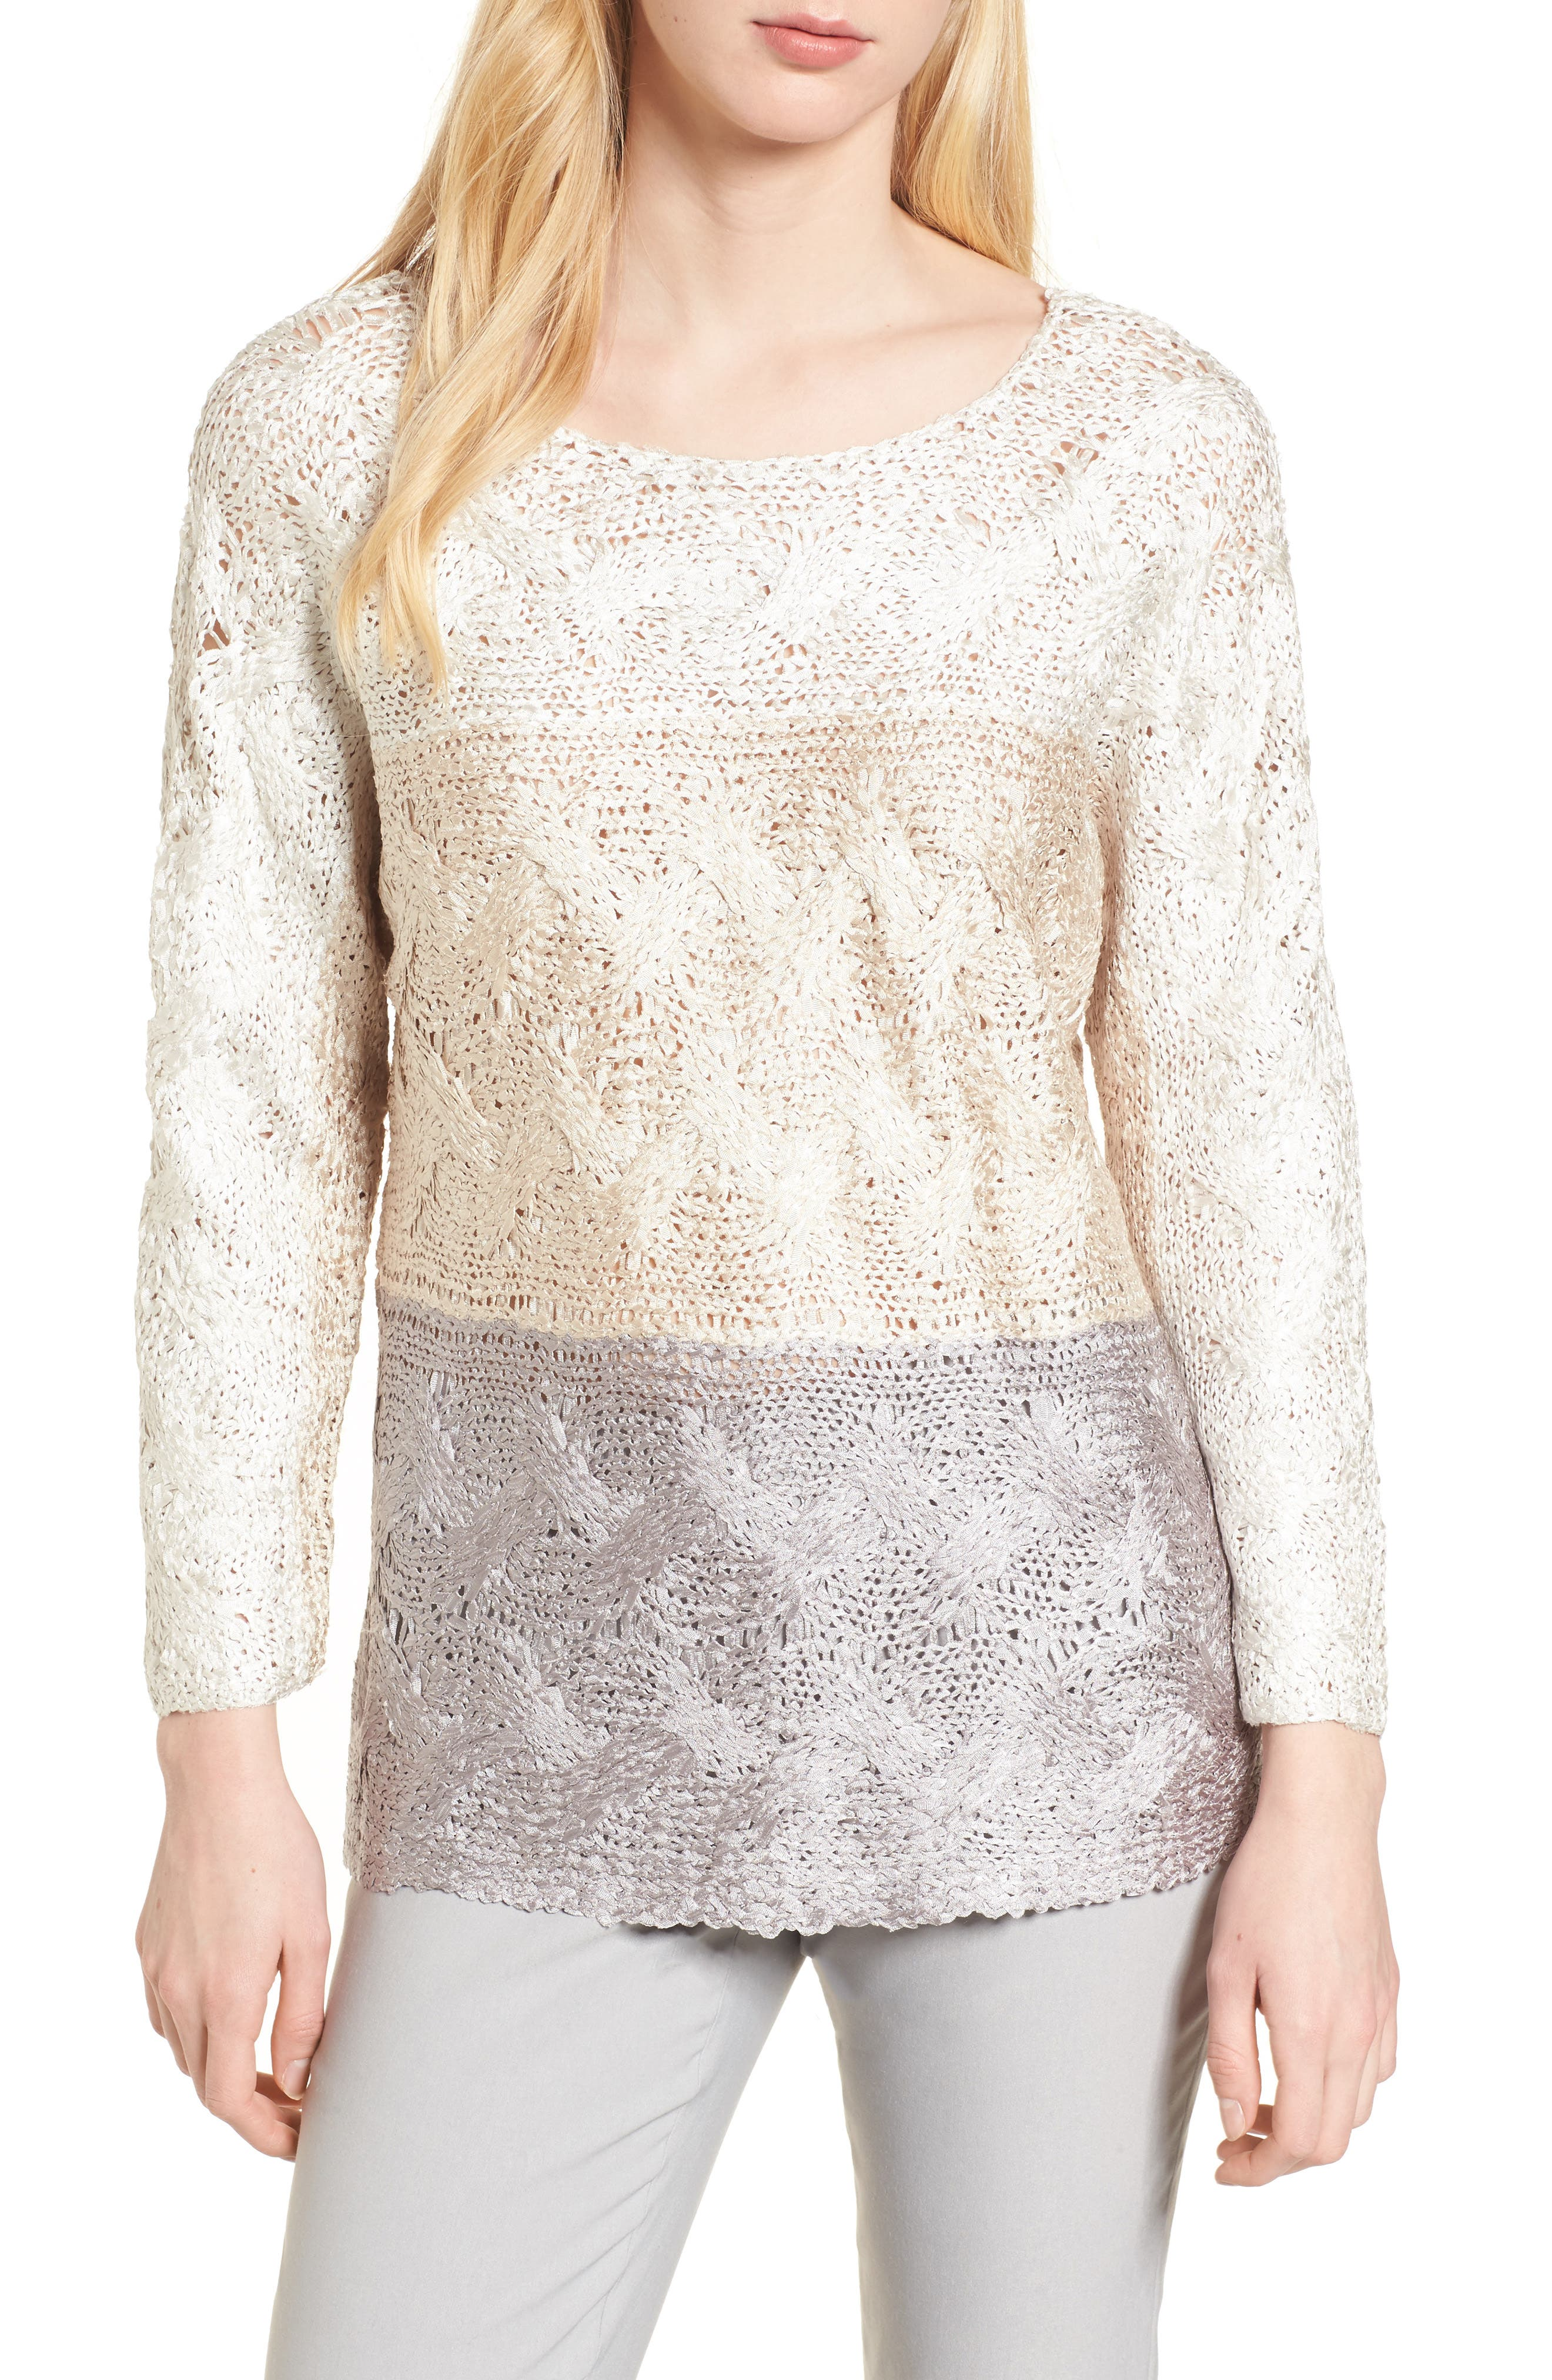 Alternate Image 1 Selected - NIC+ZOE Daydreamer Ombré Sweater